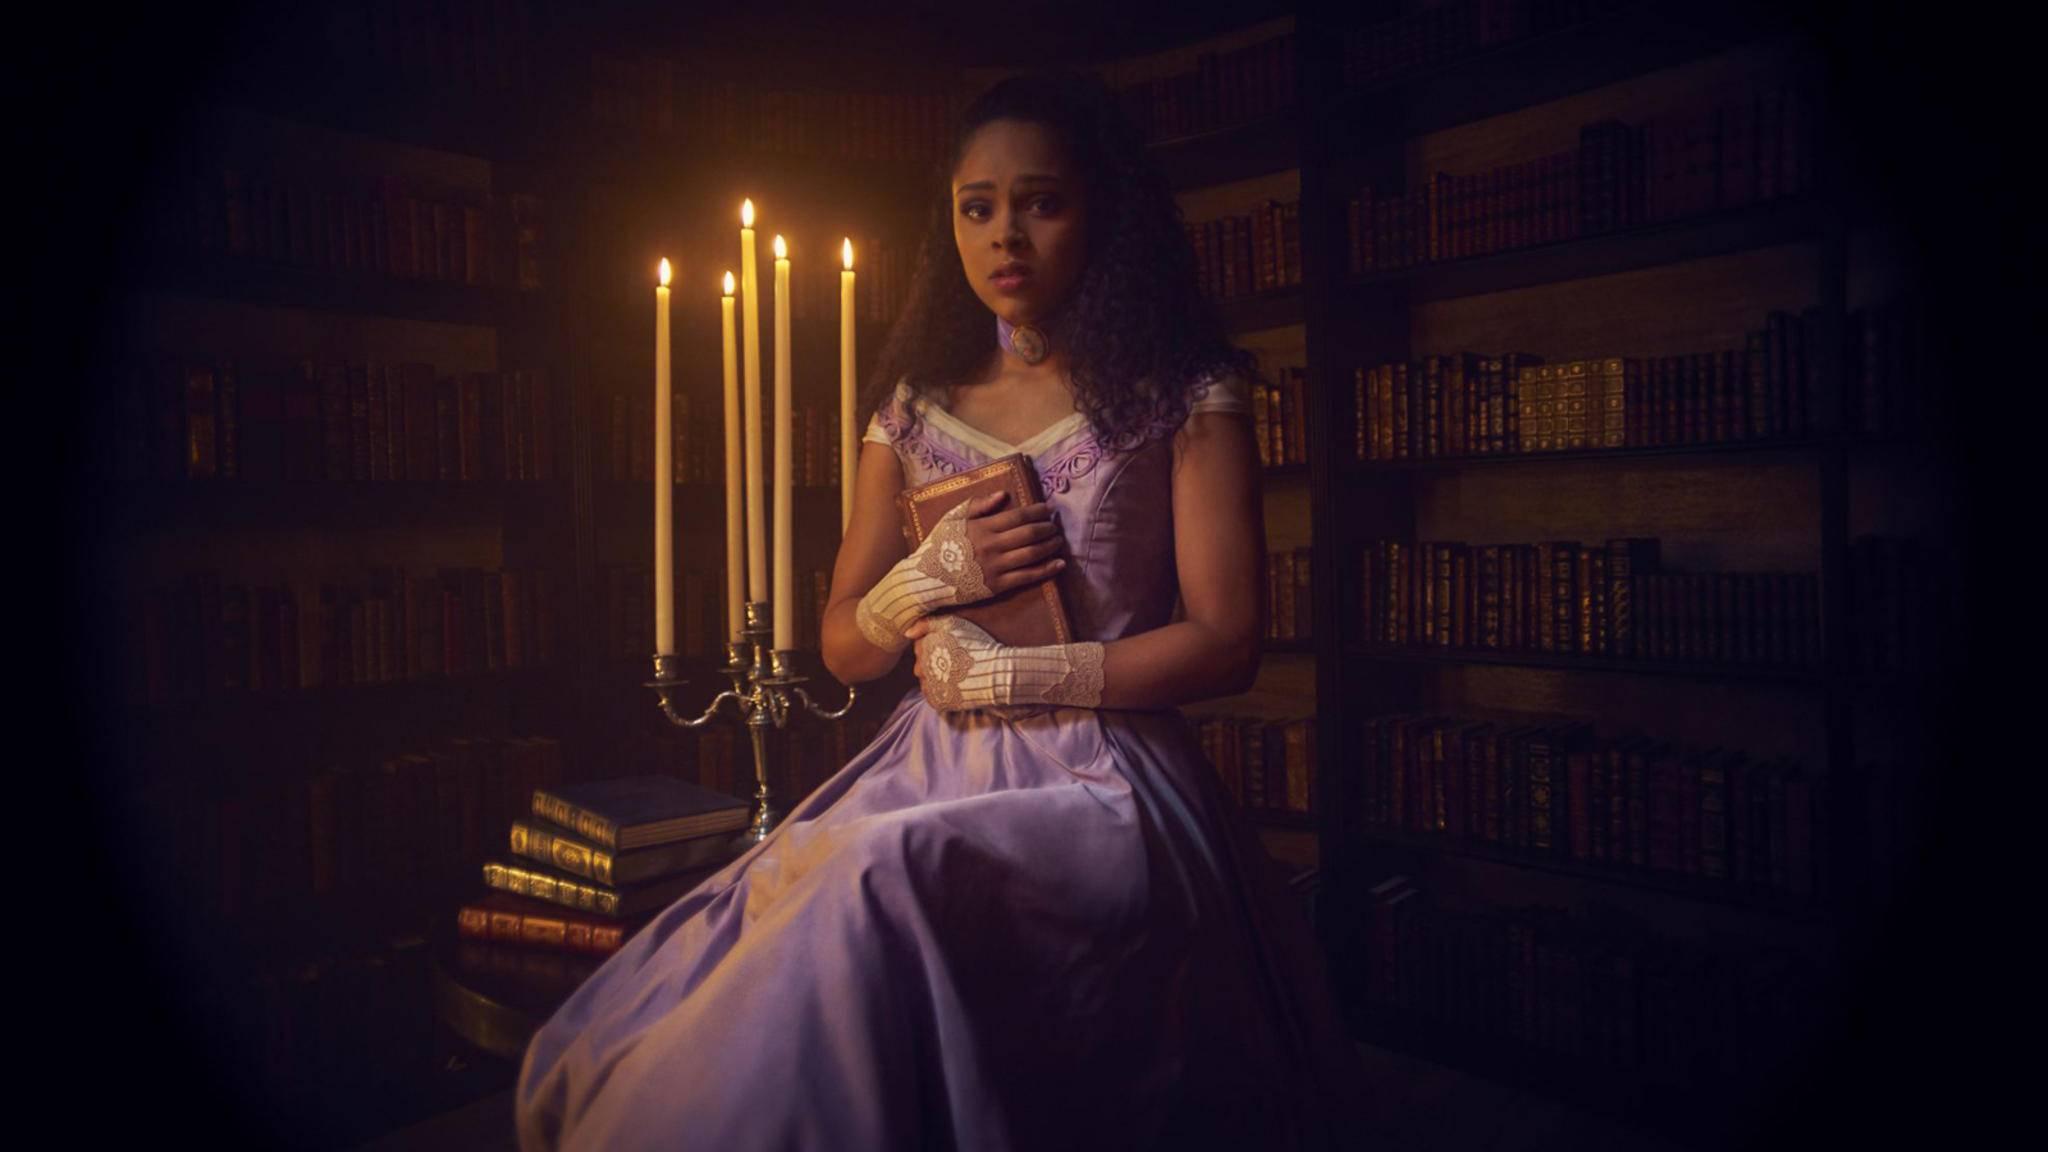 american horror story staffel 8 kritik geduld wird belohnt. Black Bedroom Furniture Sets. Home Design Ideas